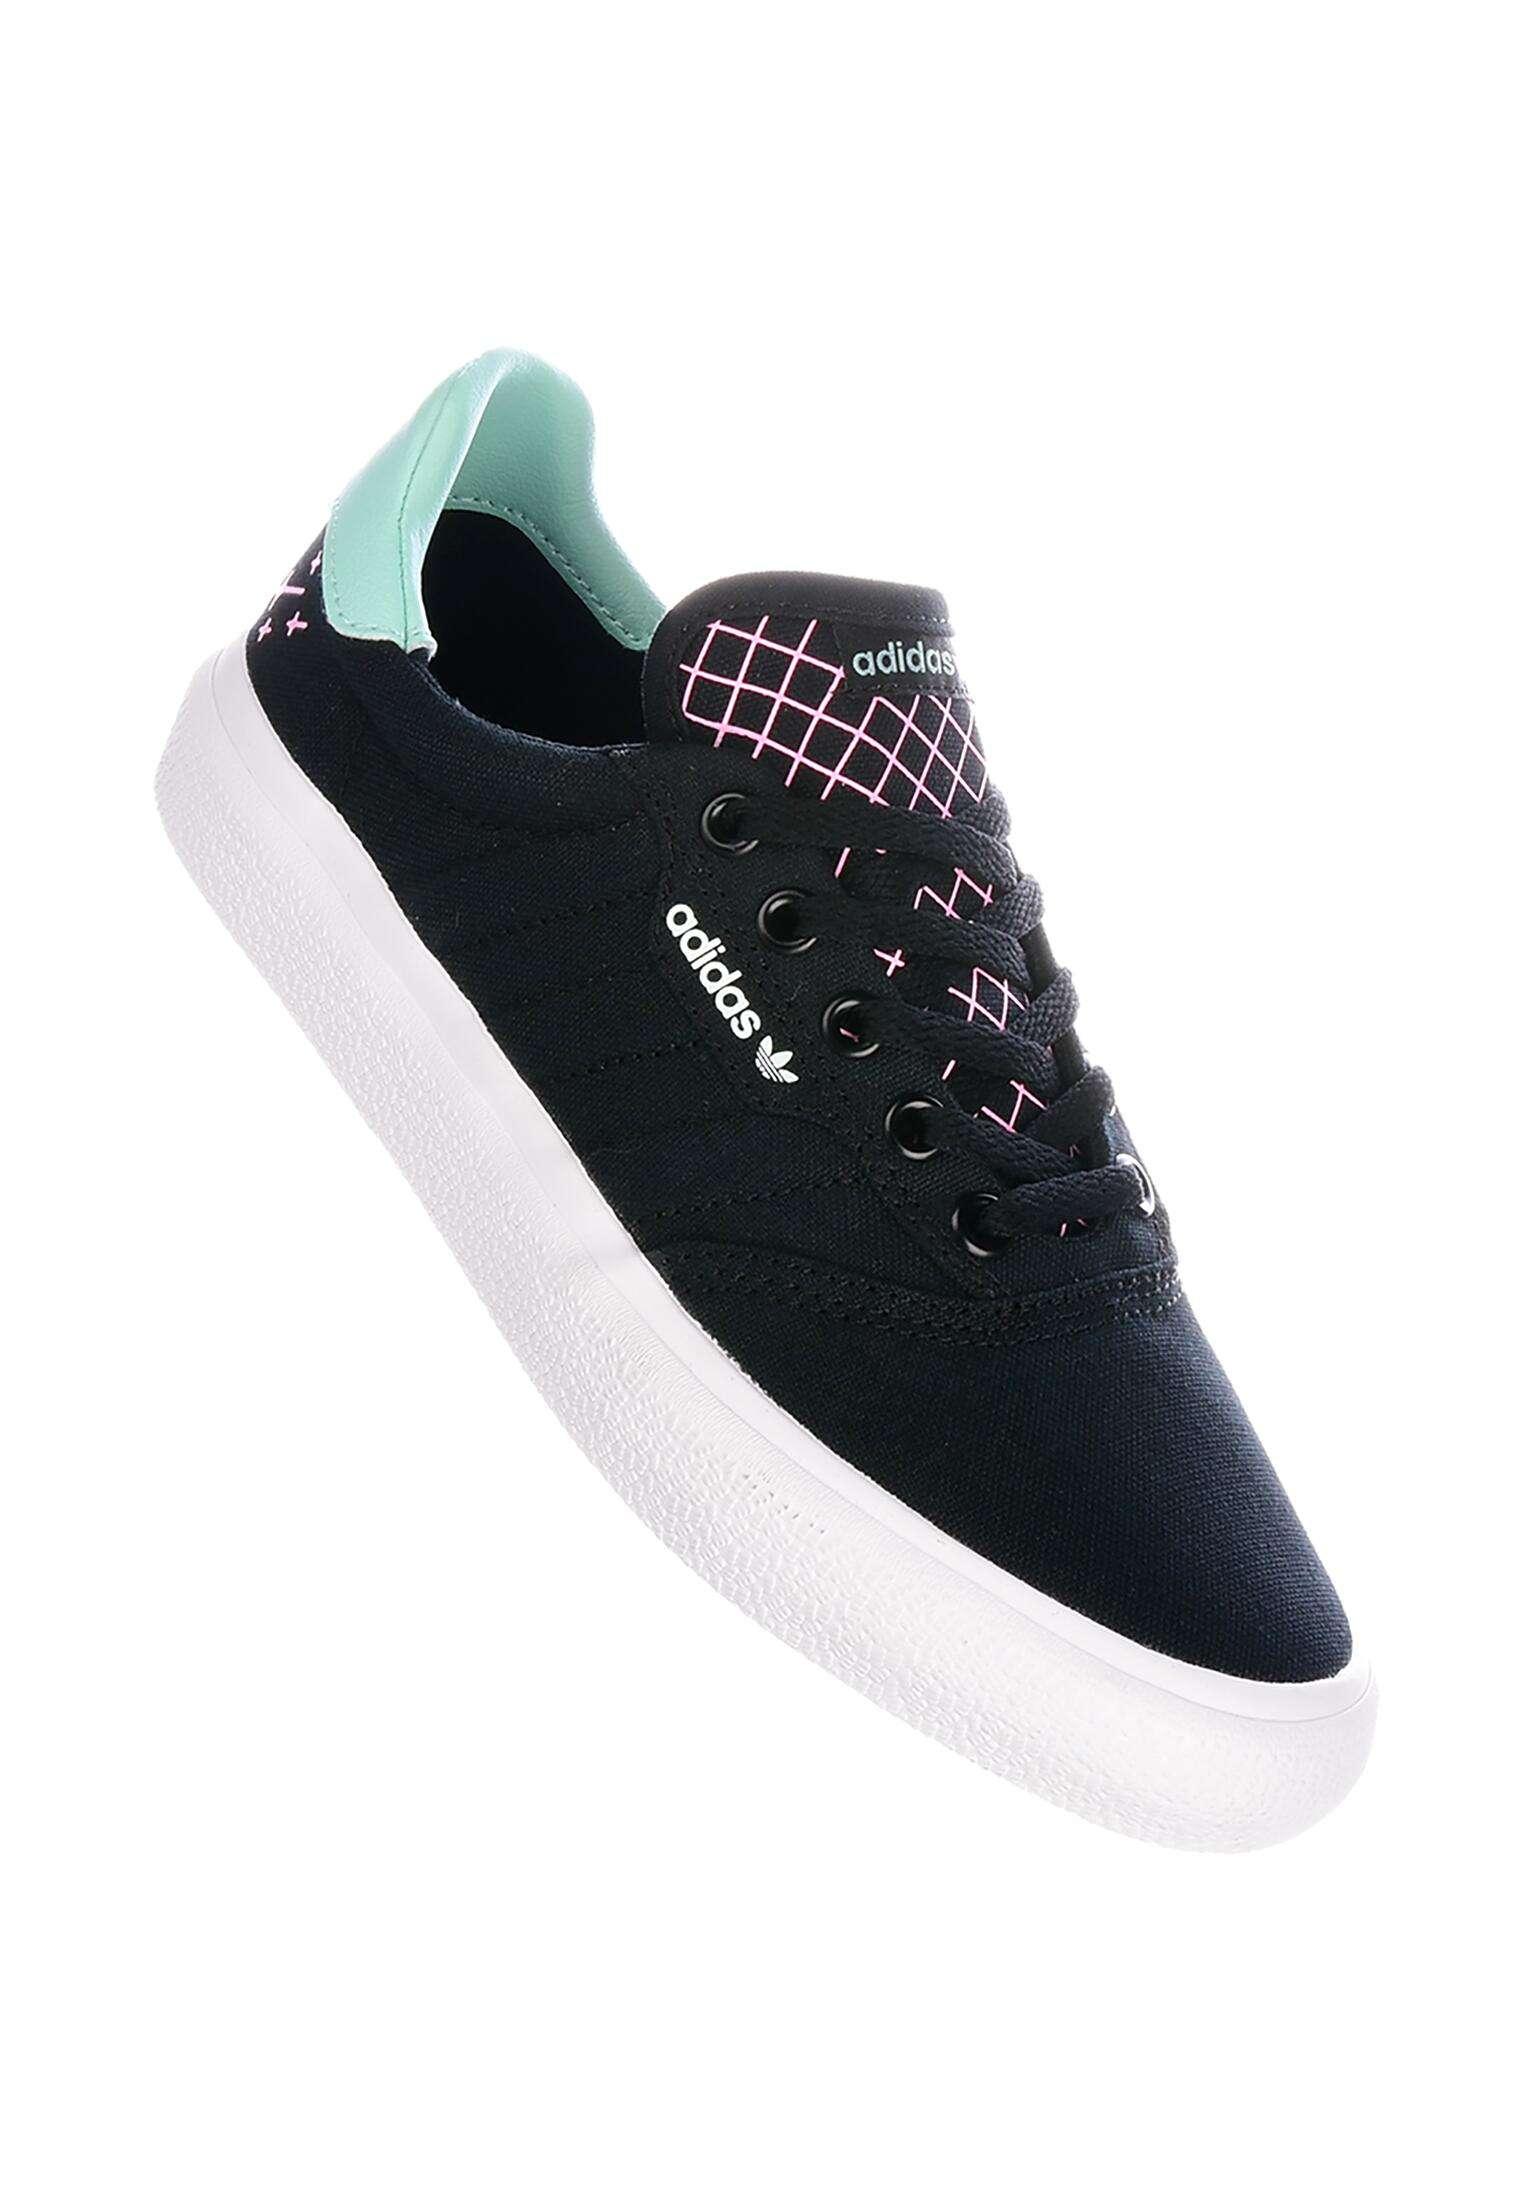 64f4668c54ed15 3MC adidas All Shoes in coreblack-clearmint-white for Women